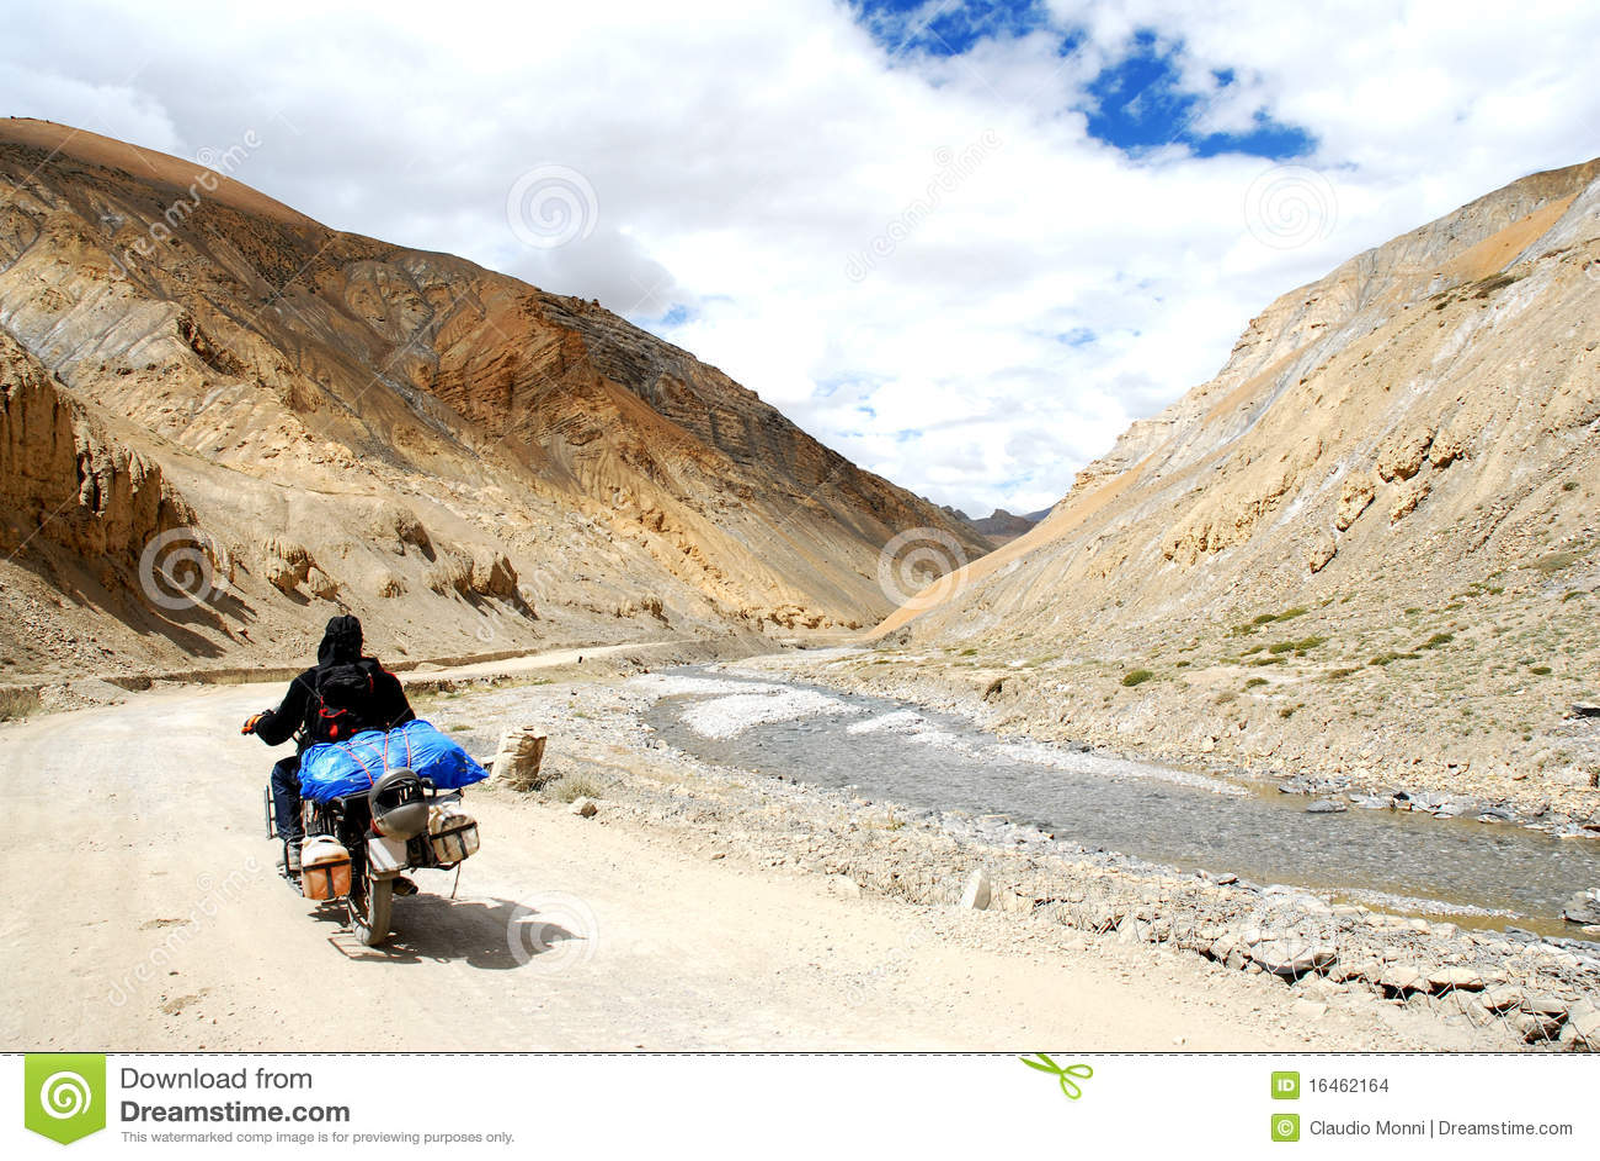 Rango de Himalaya